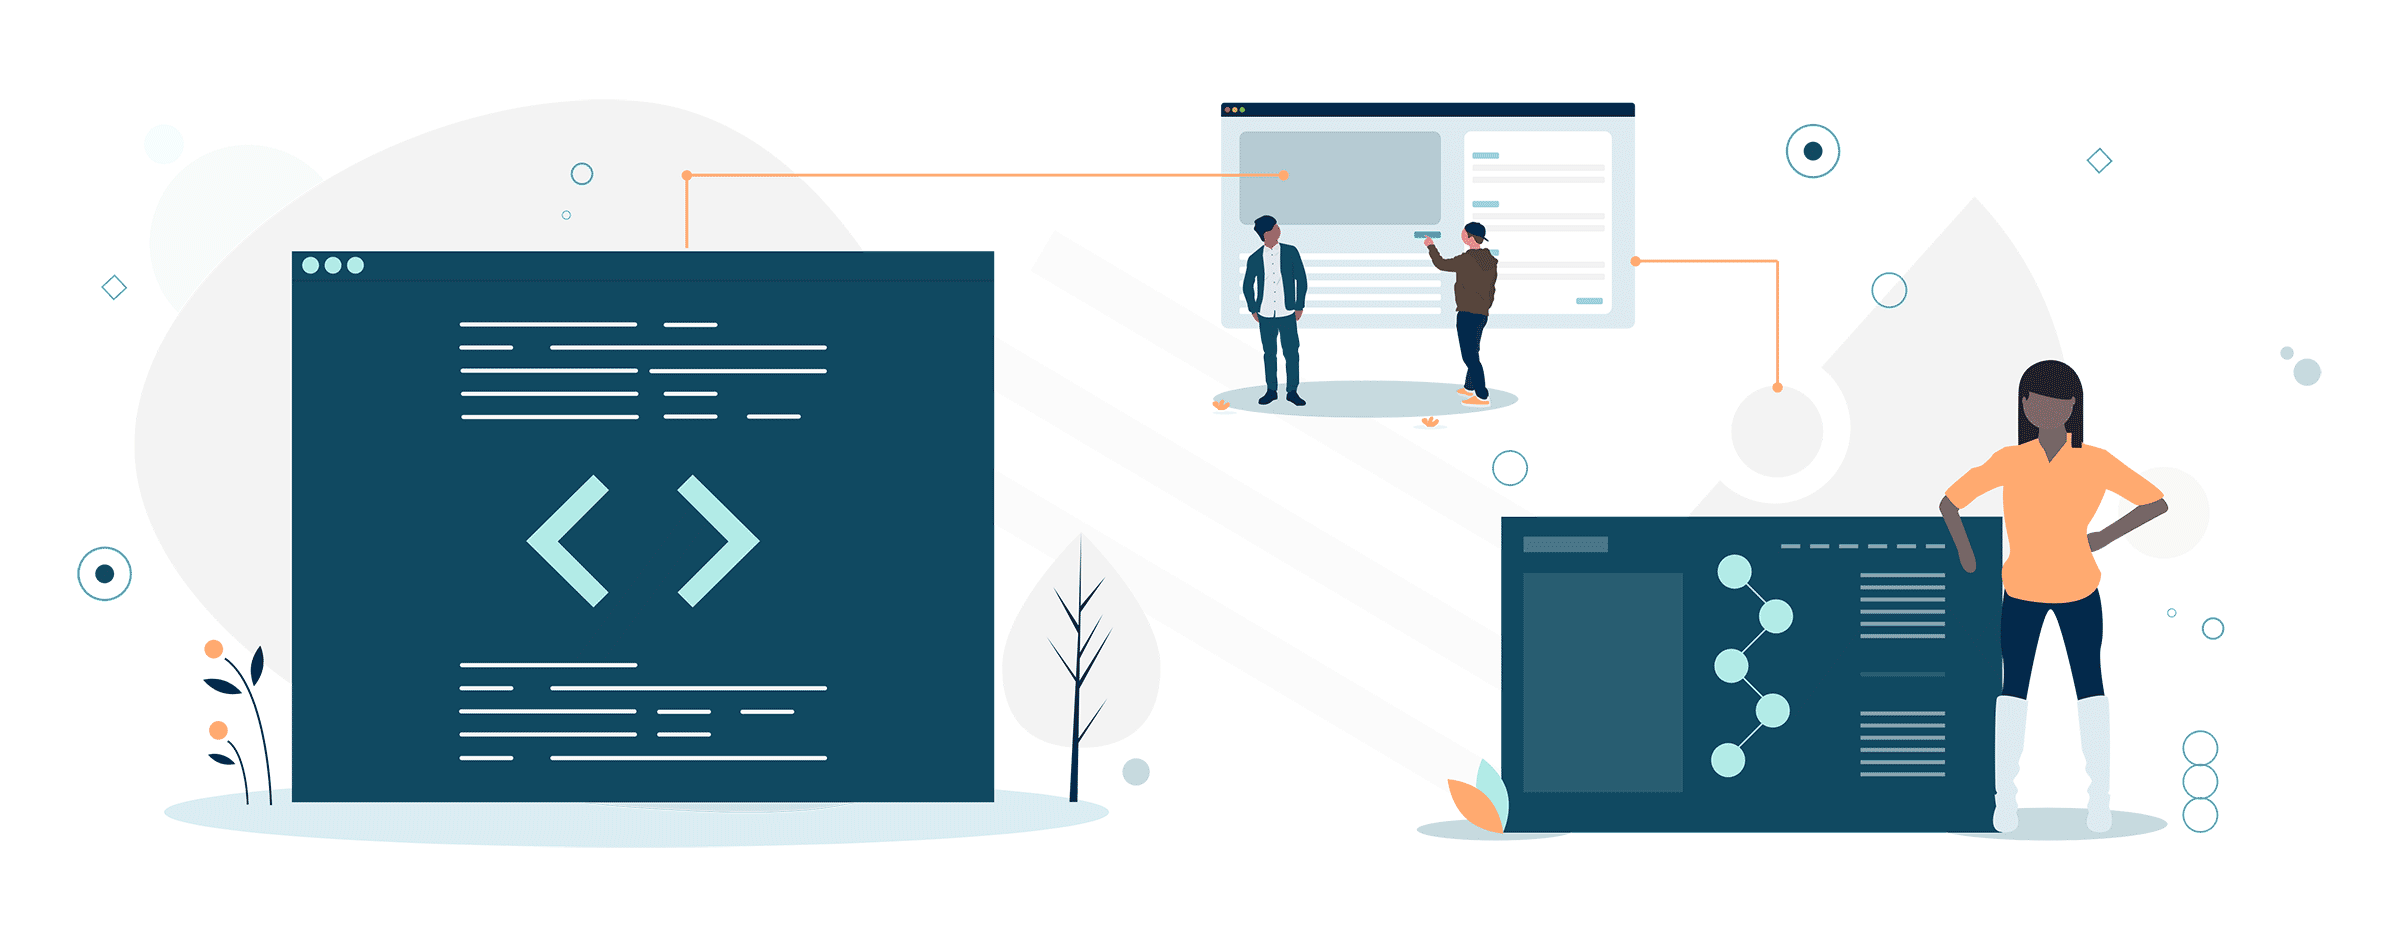 Elemental Concept - Software Development Illustration